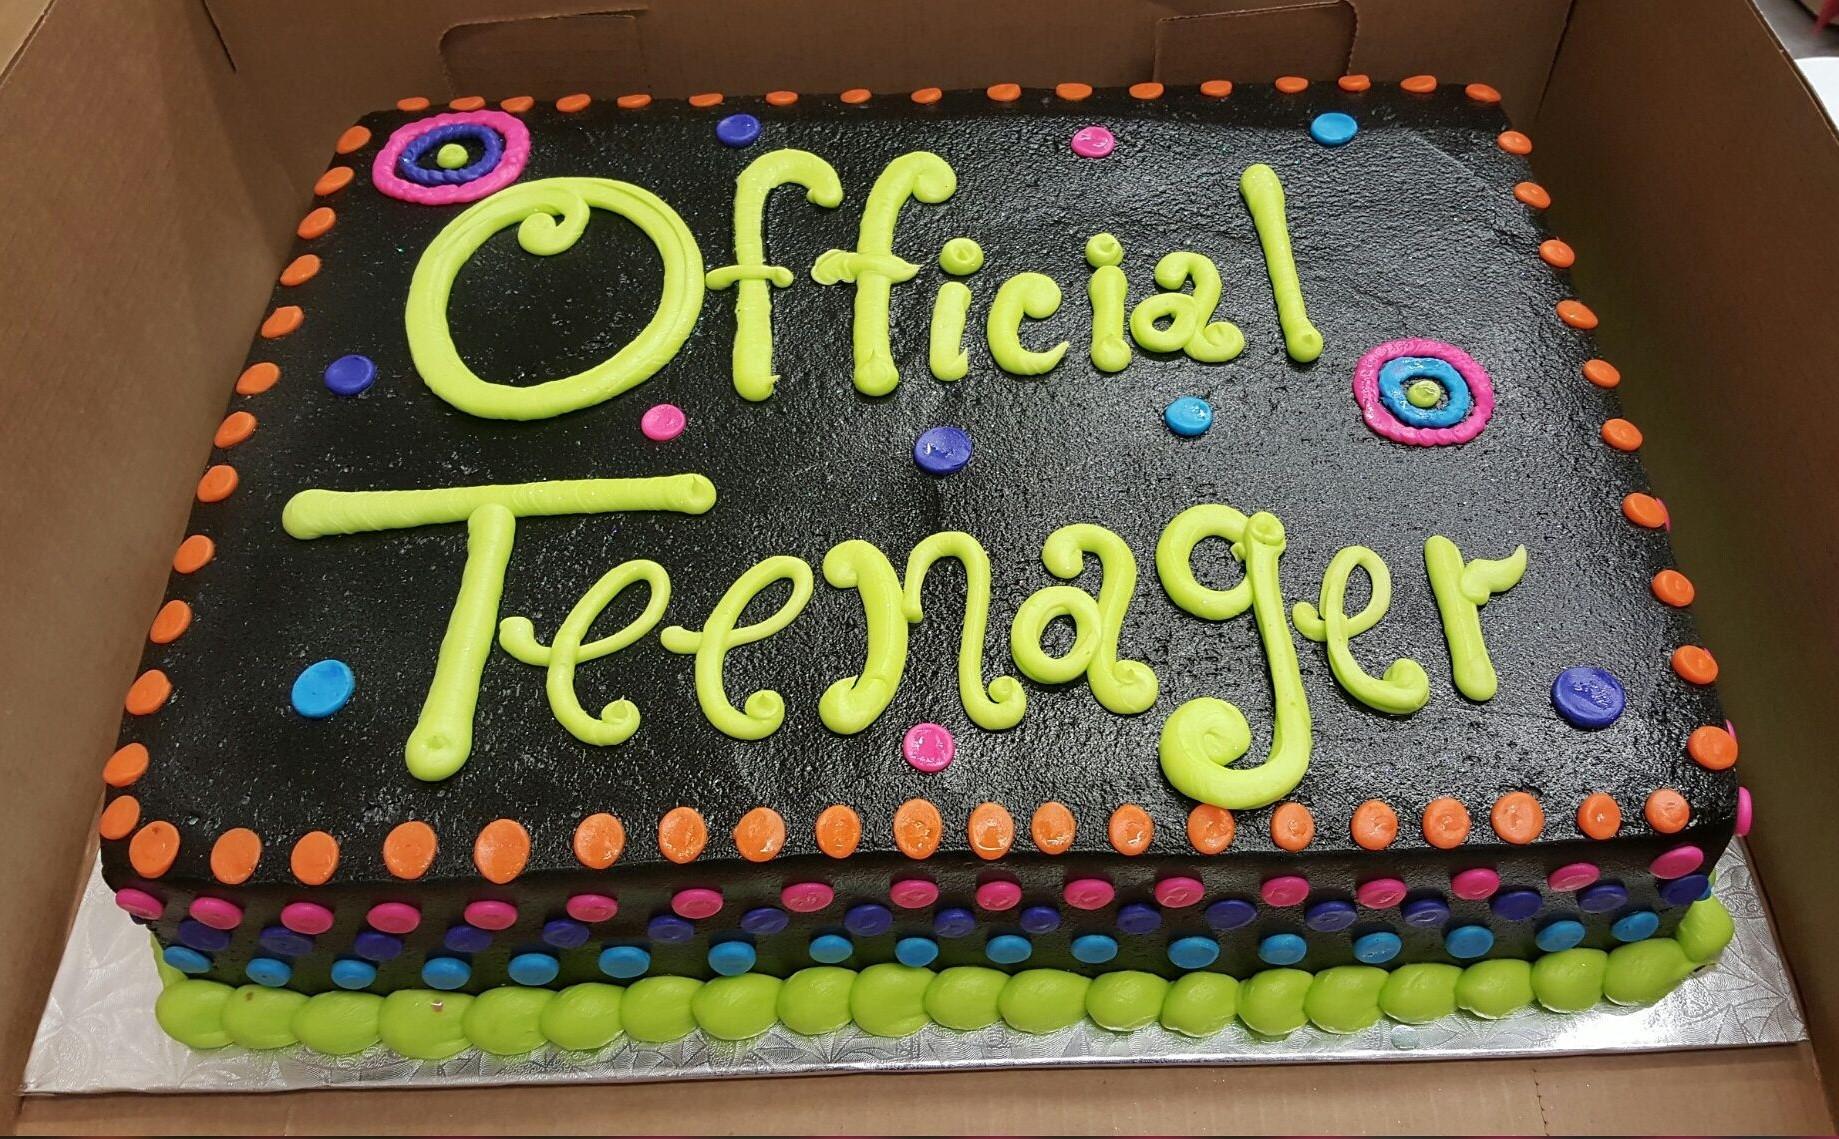 13 Year Old Boy Birthday Cake Ideas Best Of Calumet Bakery Ficial Teenager Cake Raising Teens Today